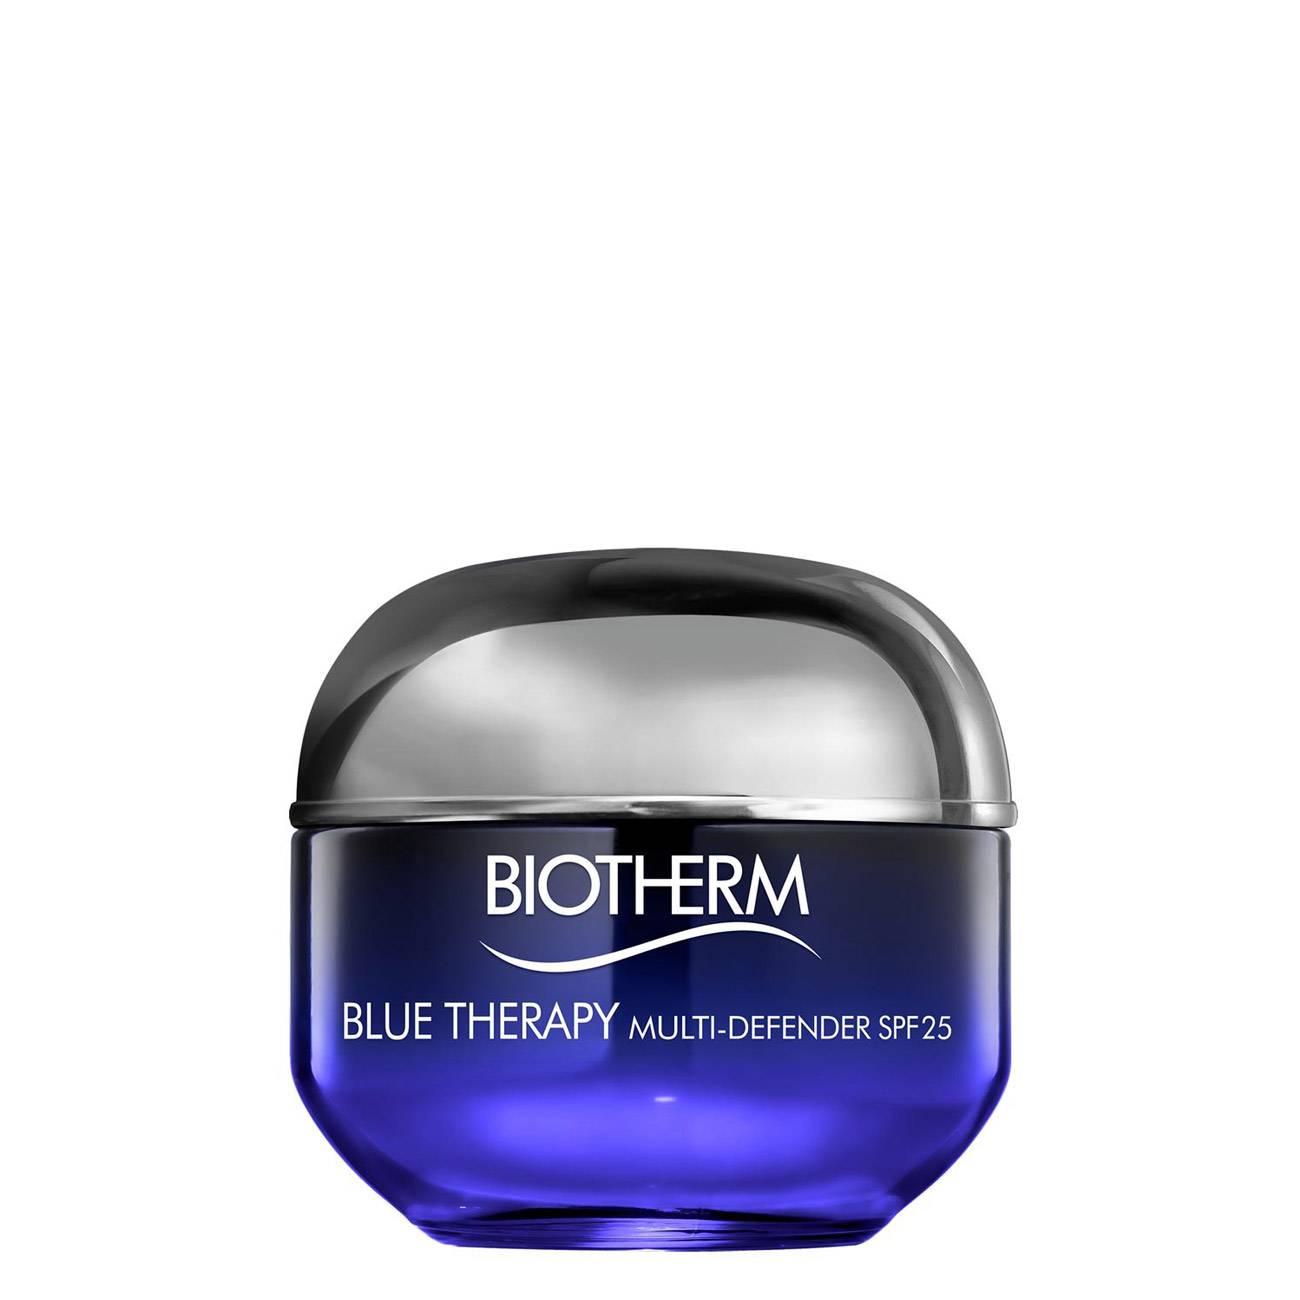 BLUE THERAPY MULTI-DEFENDER 50 ML